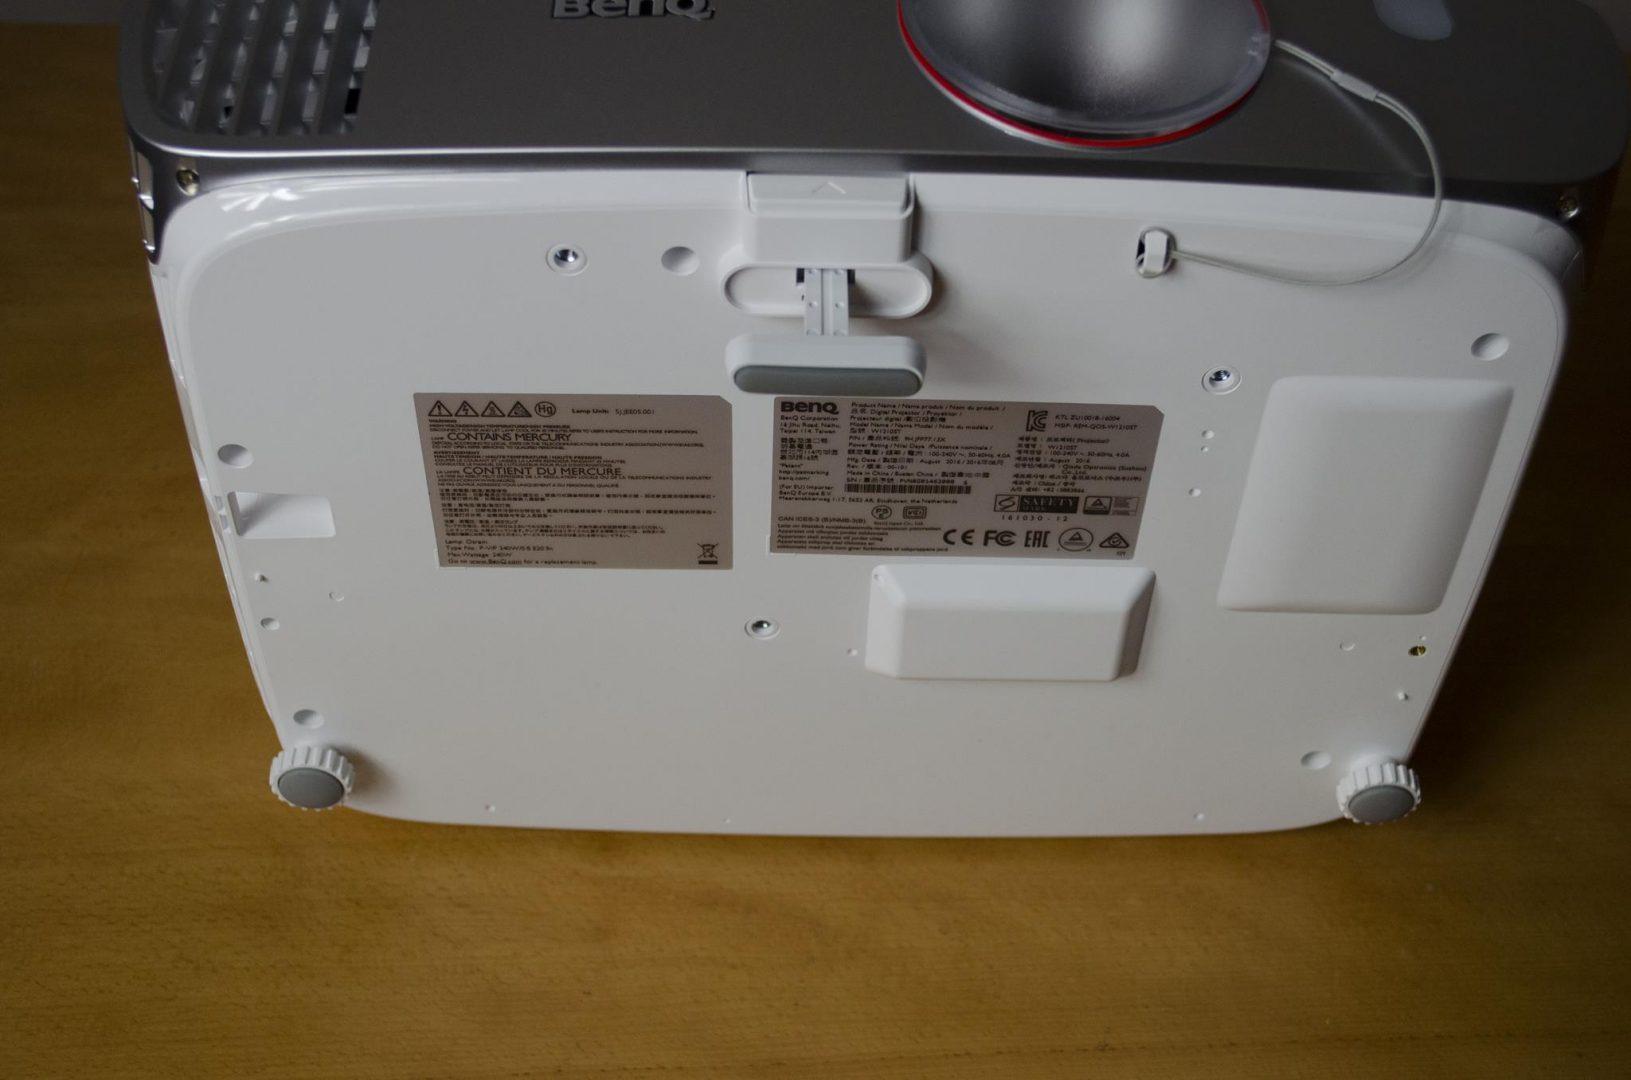 benq w1210st projector_8